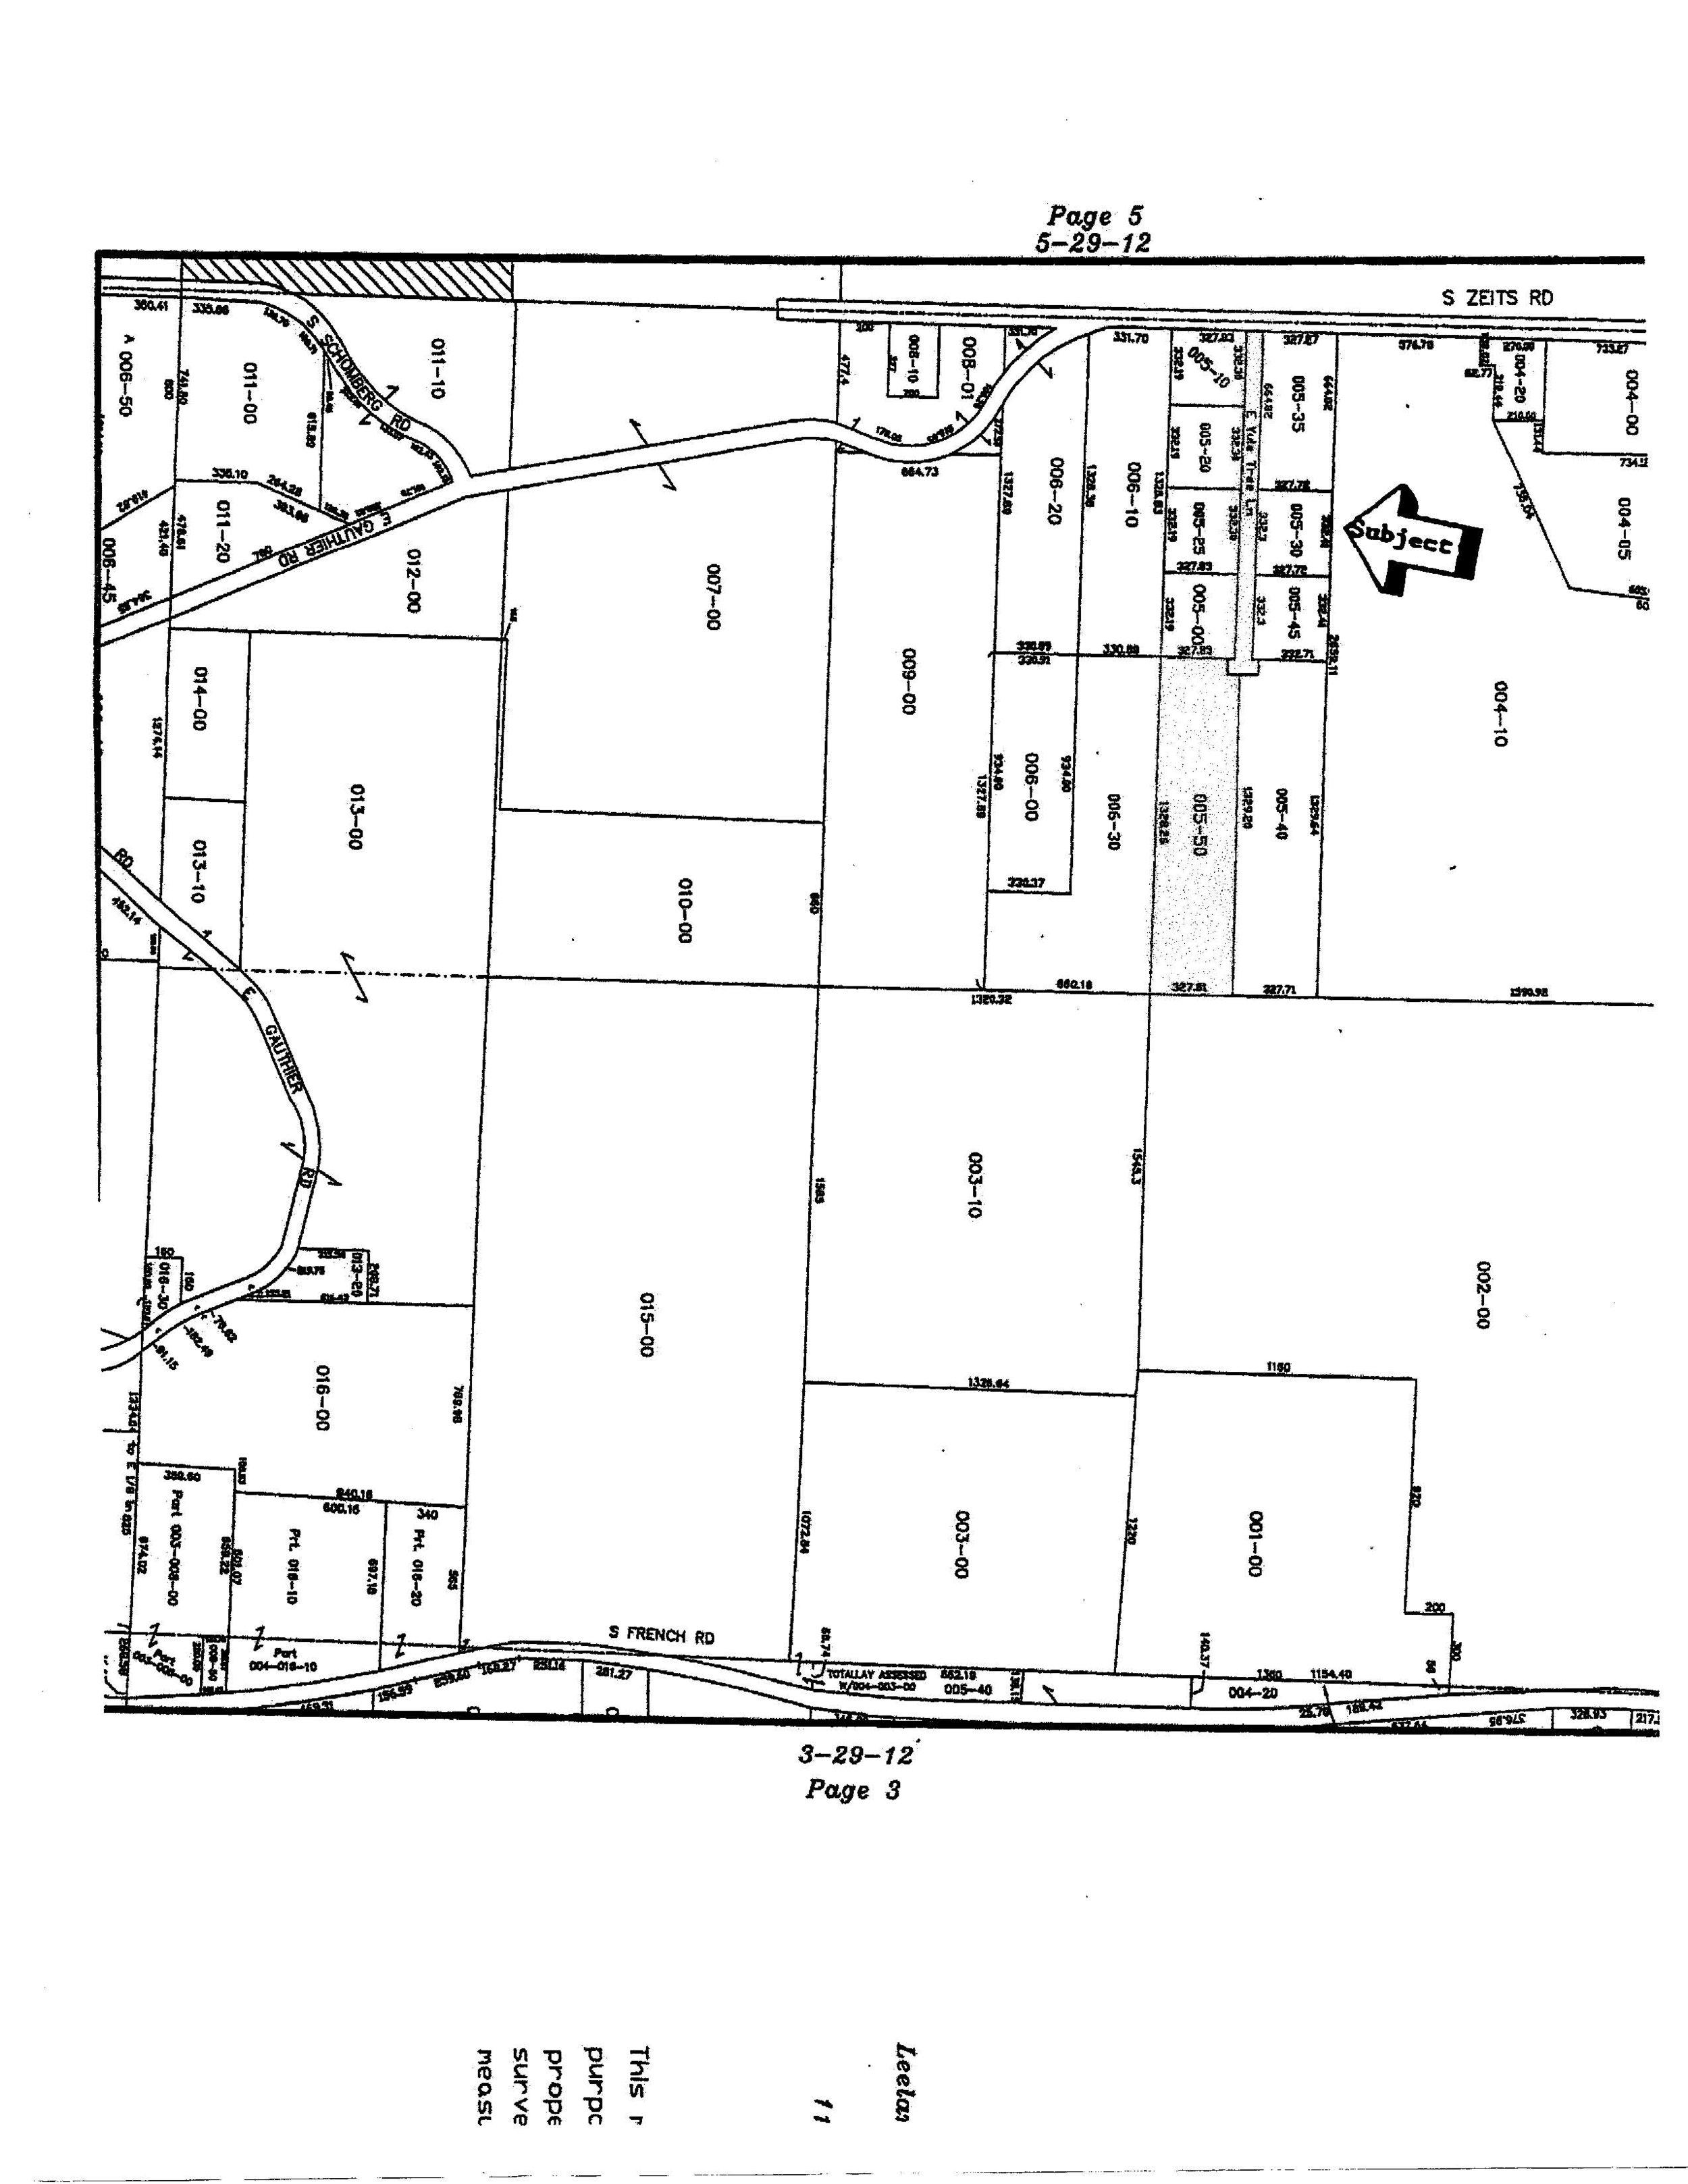 4037 E Yule Tree Lane, Lake Leelanau – FOR SALE by Oltersdorf Realty LLC - Marketing Packet (11).jpg